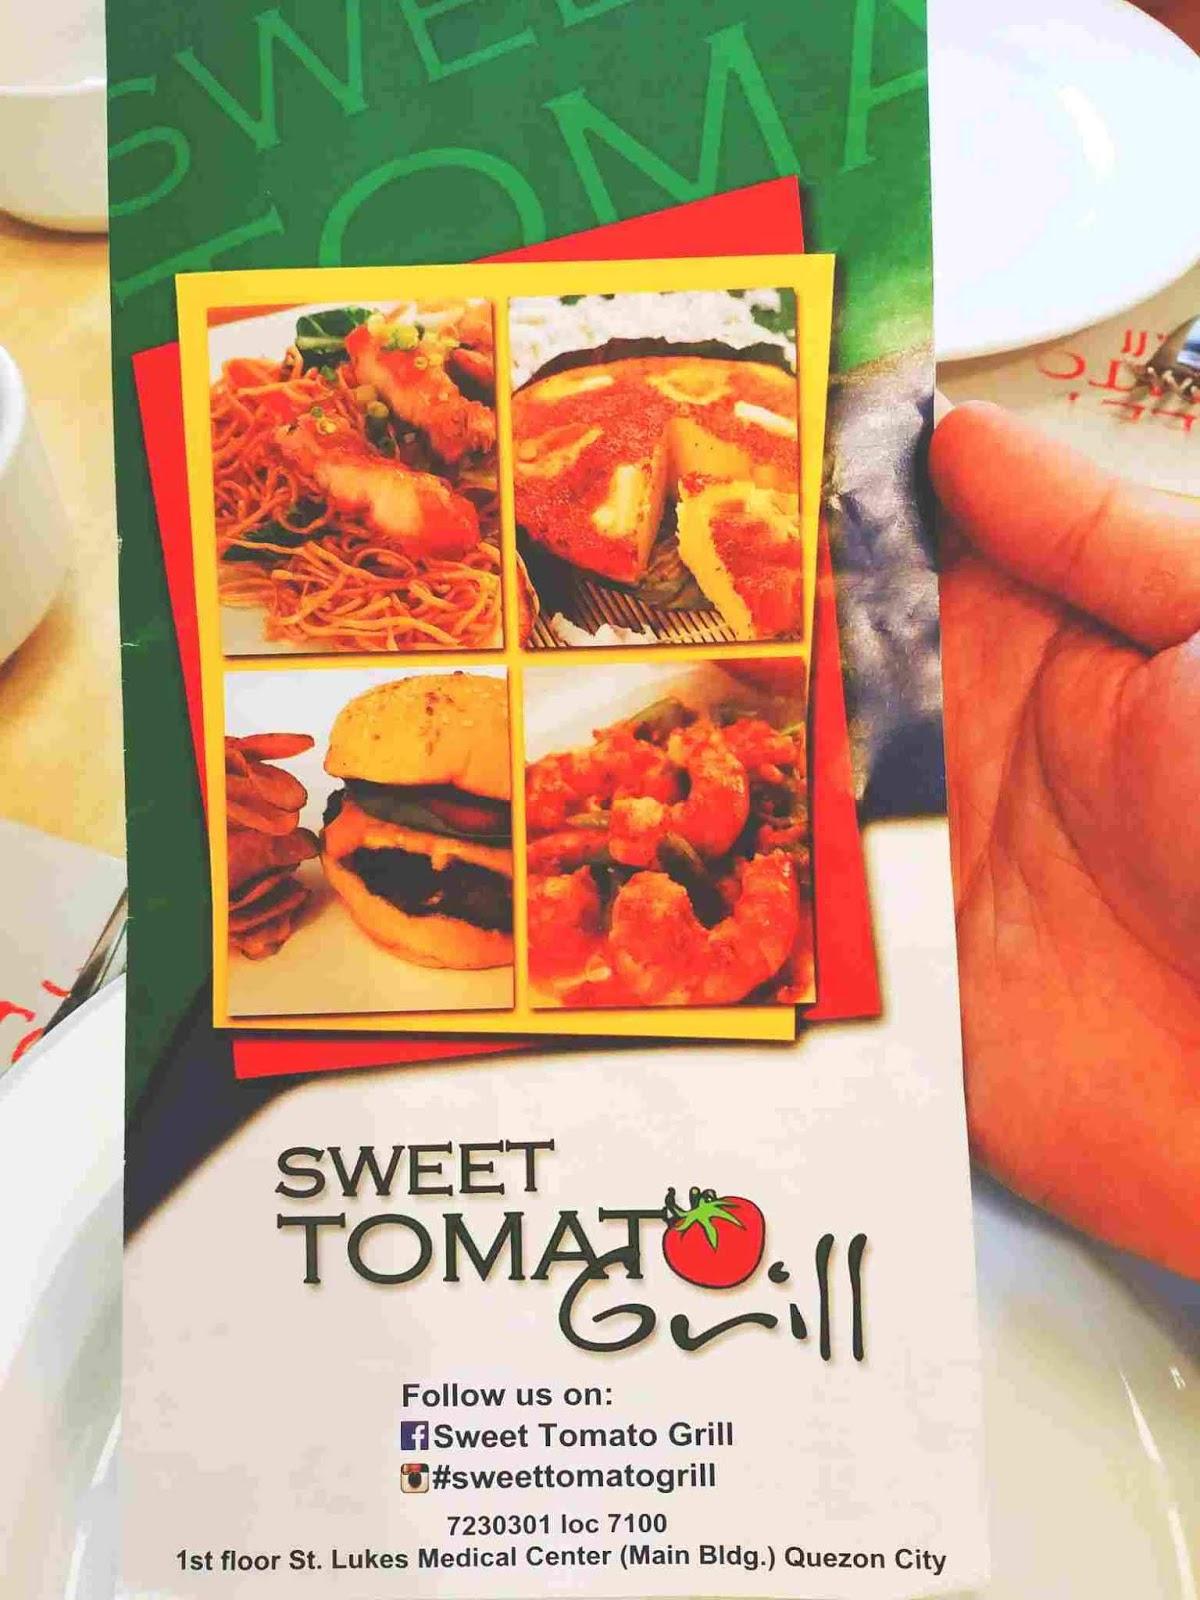 Sweet Tomato Grill menu